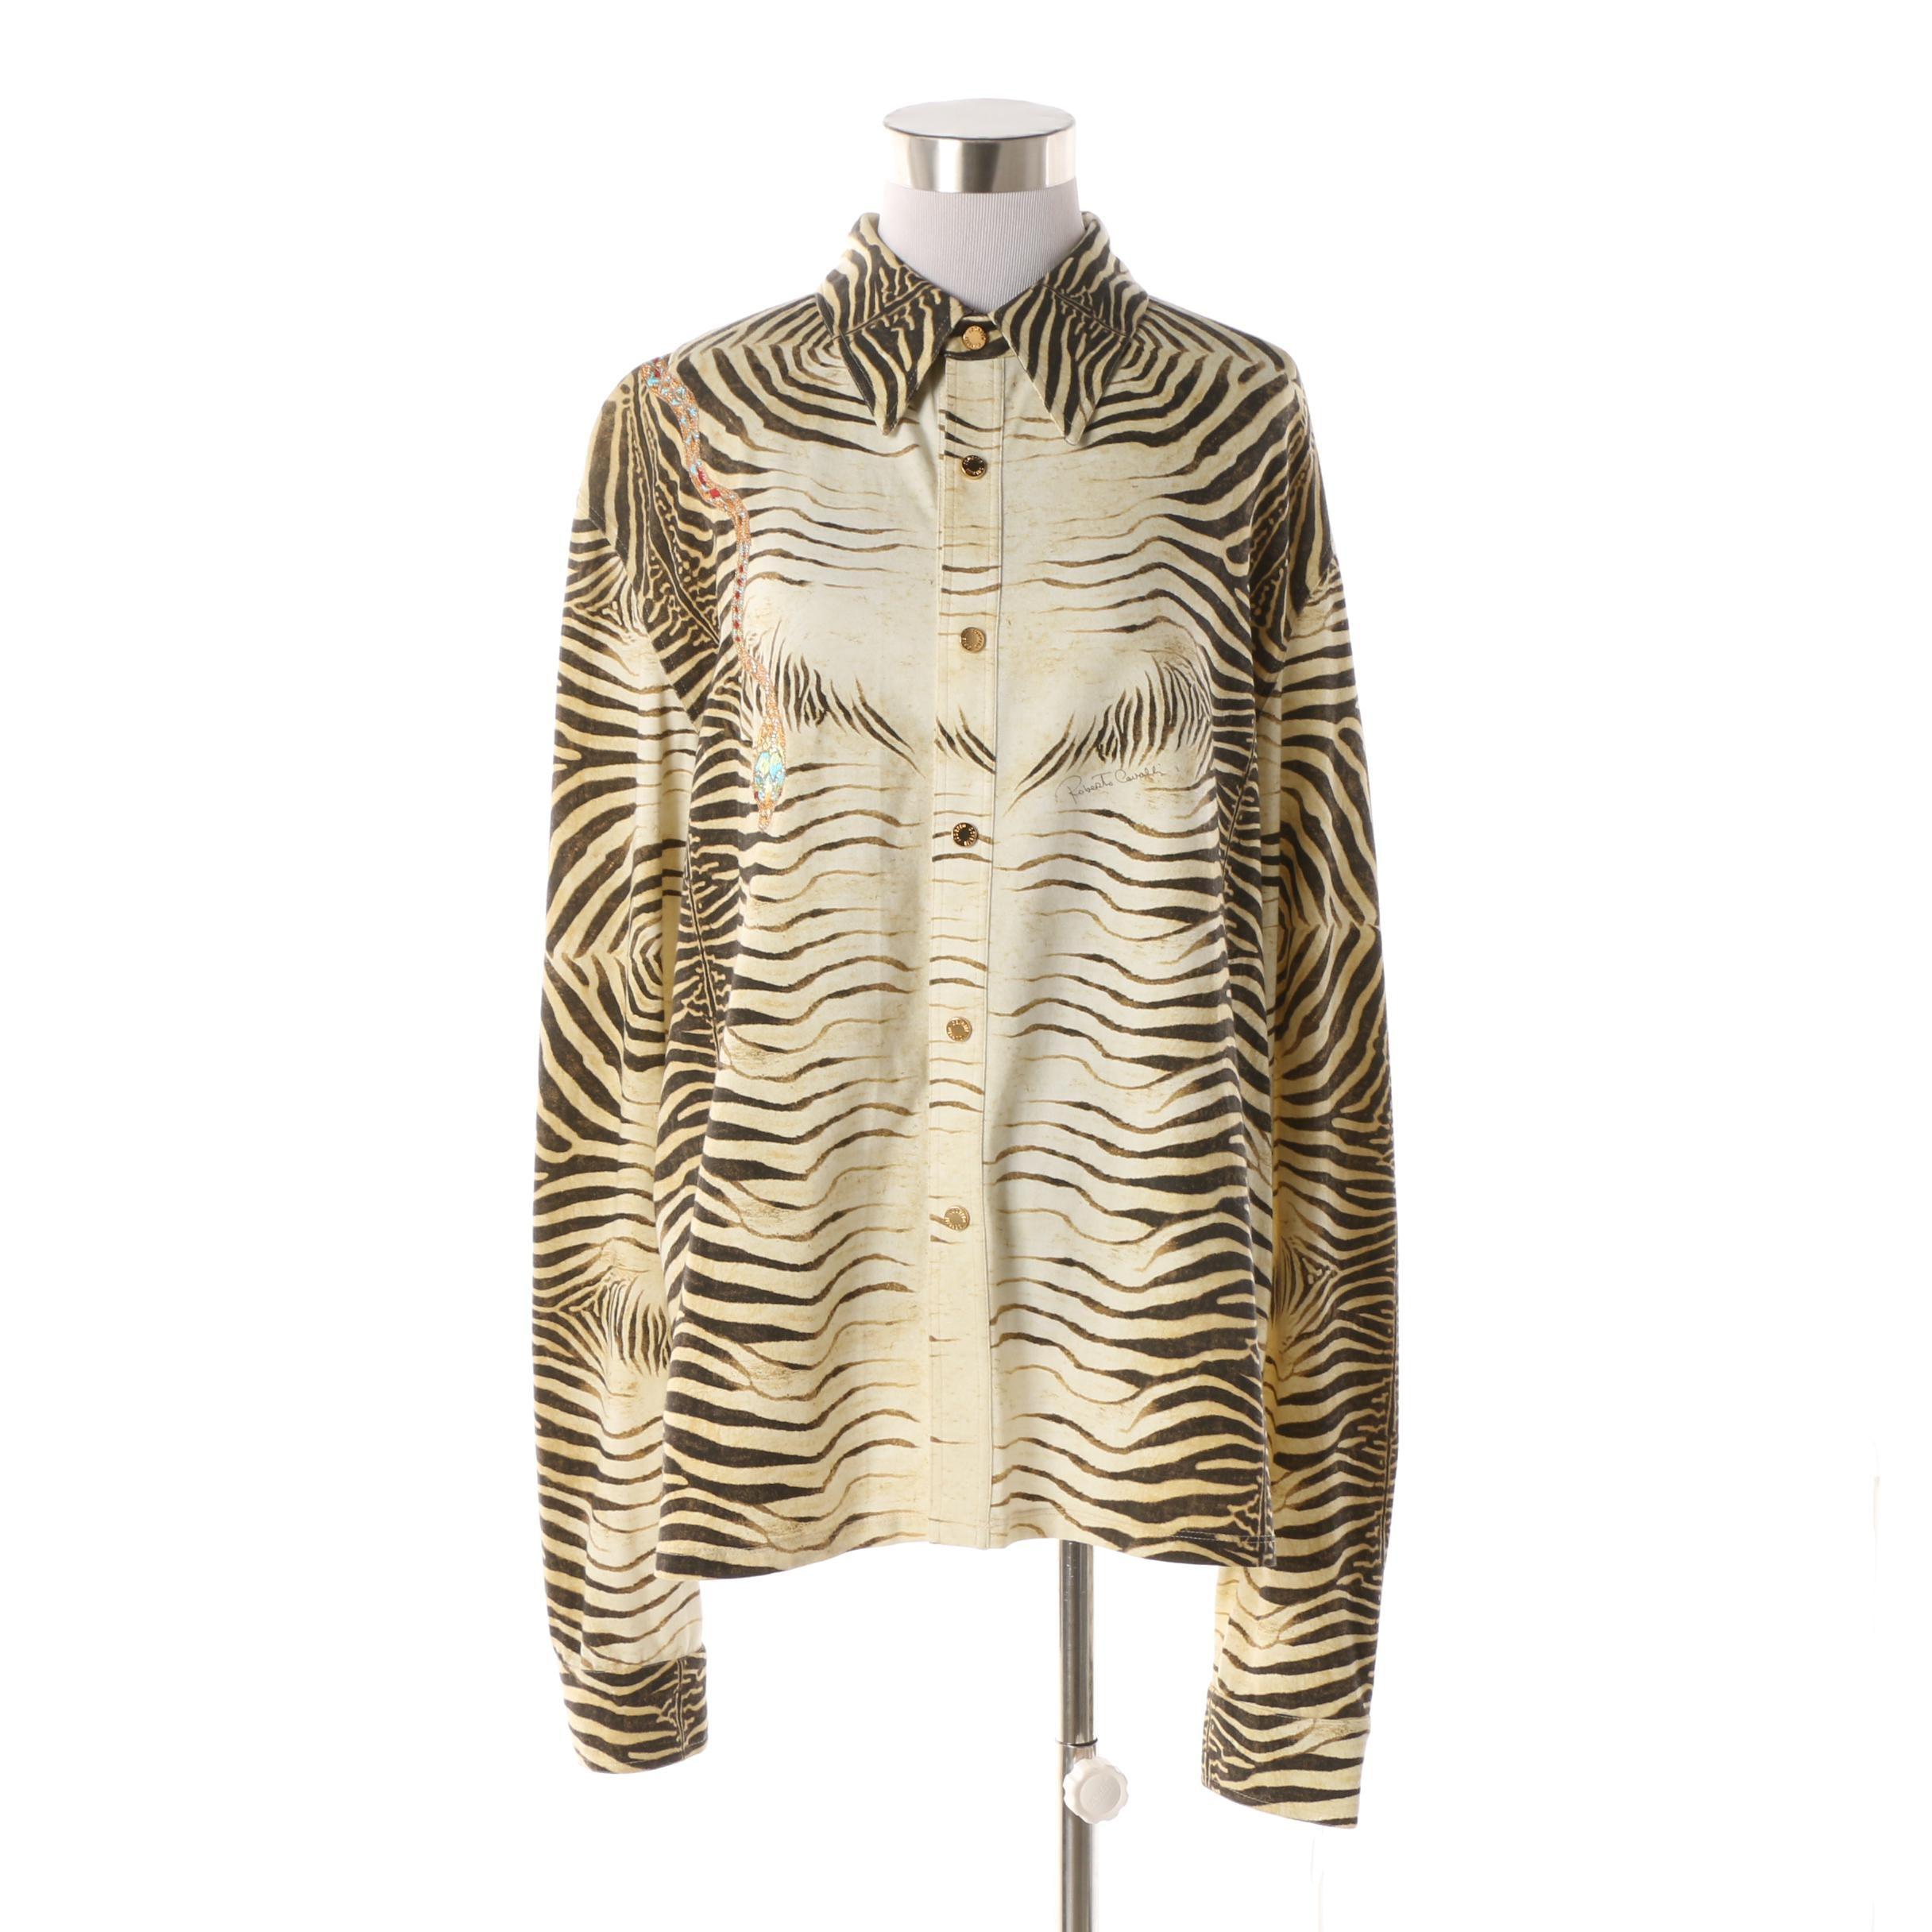 Men's Roberto Cavalli Embellished Zebra Print Shirt